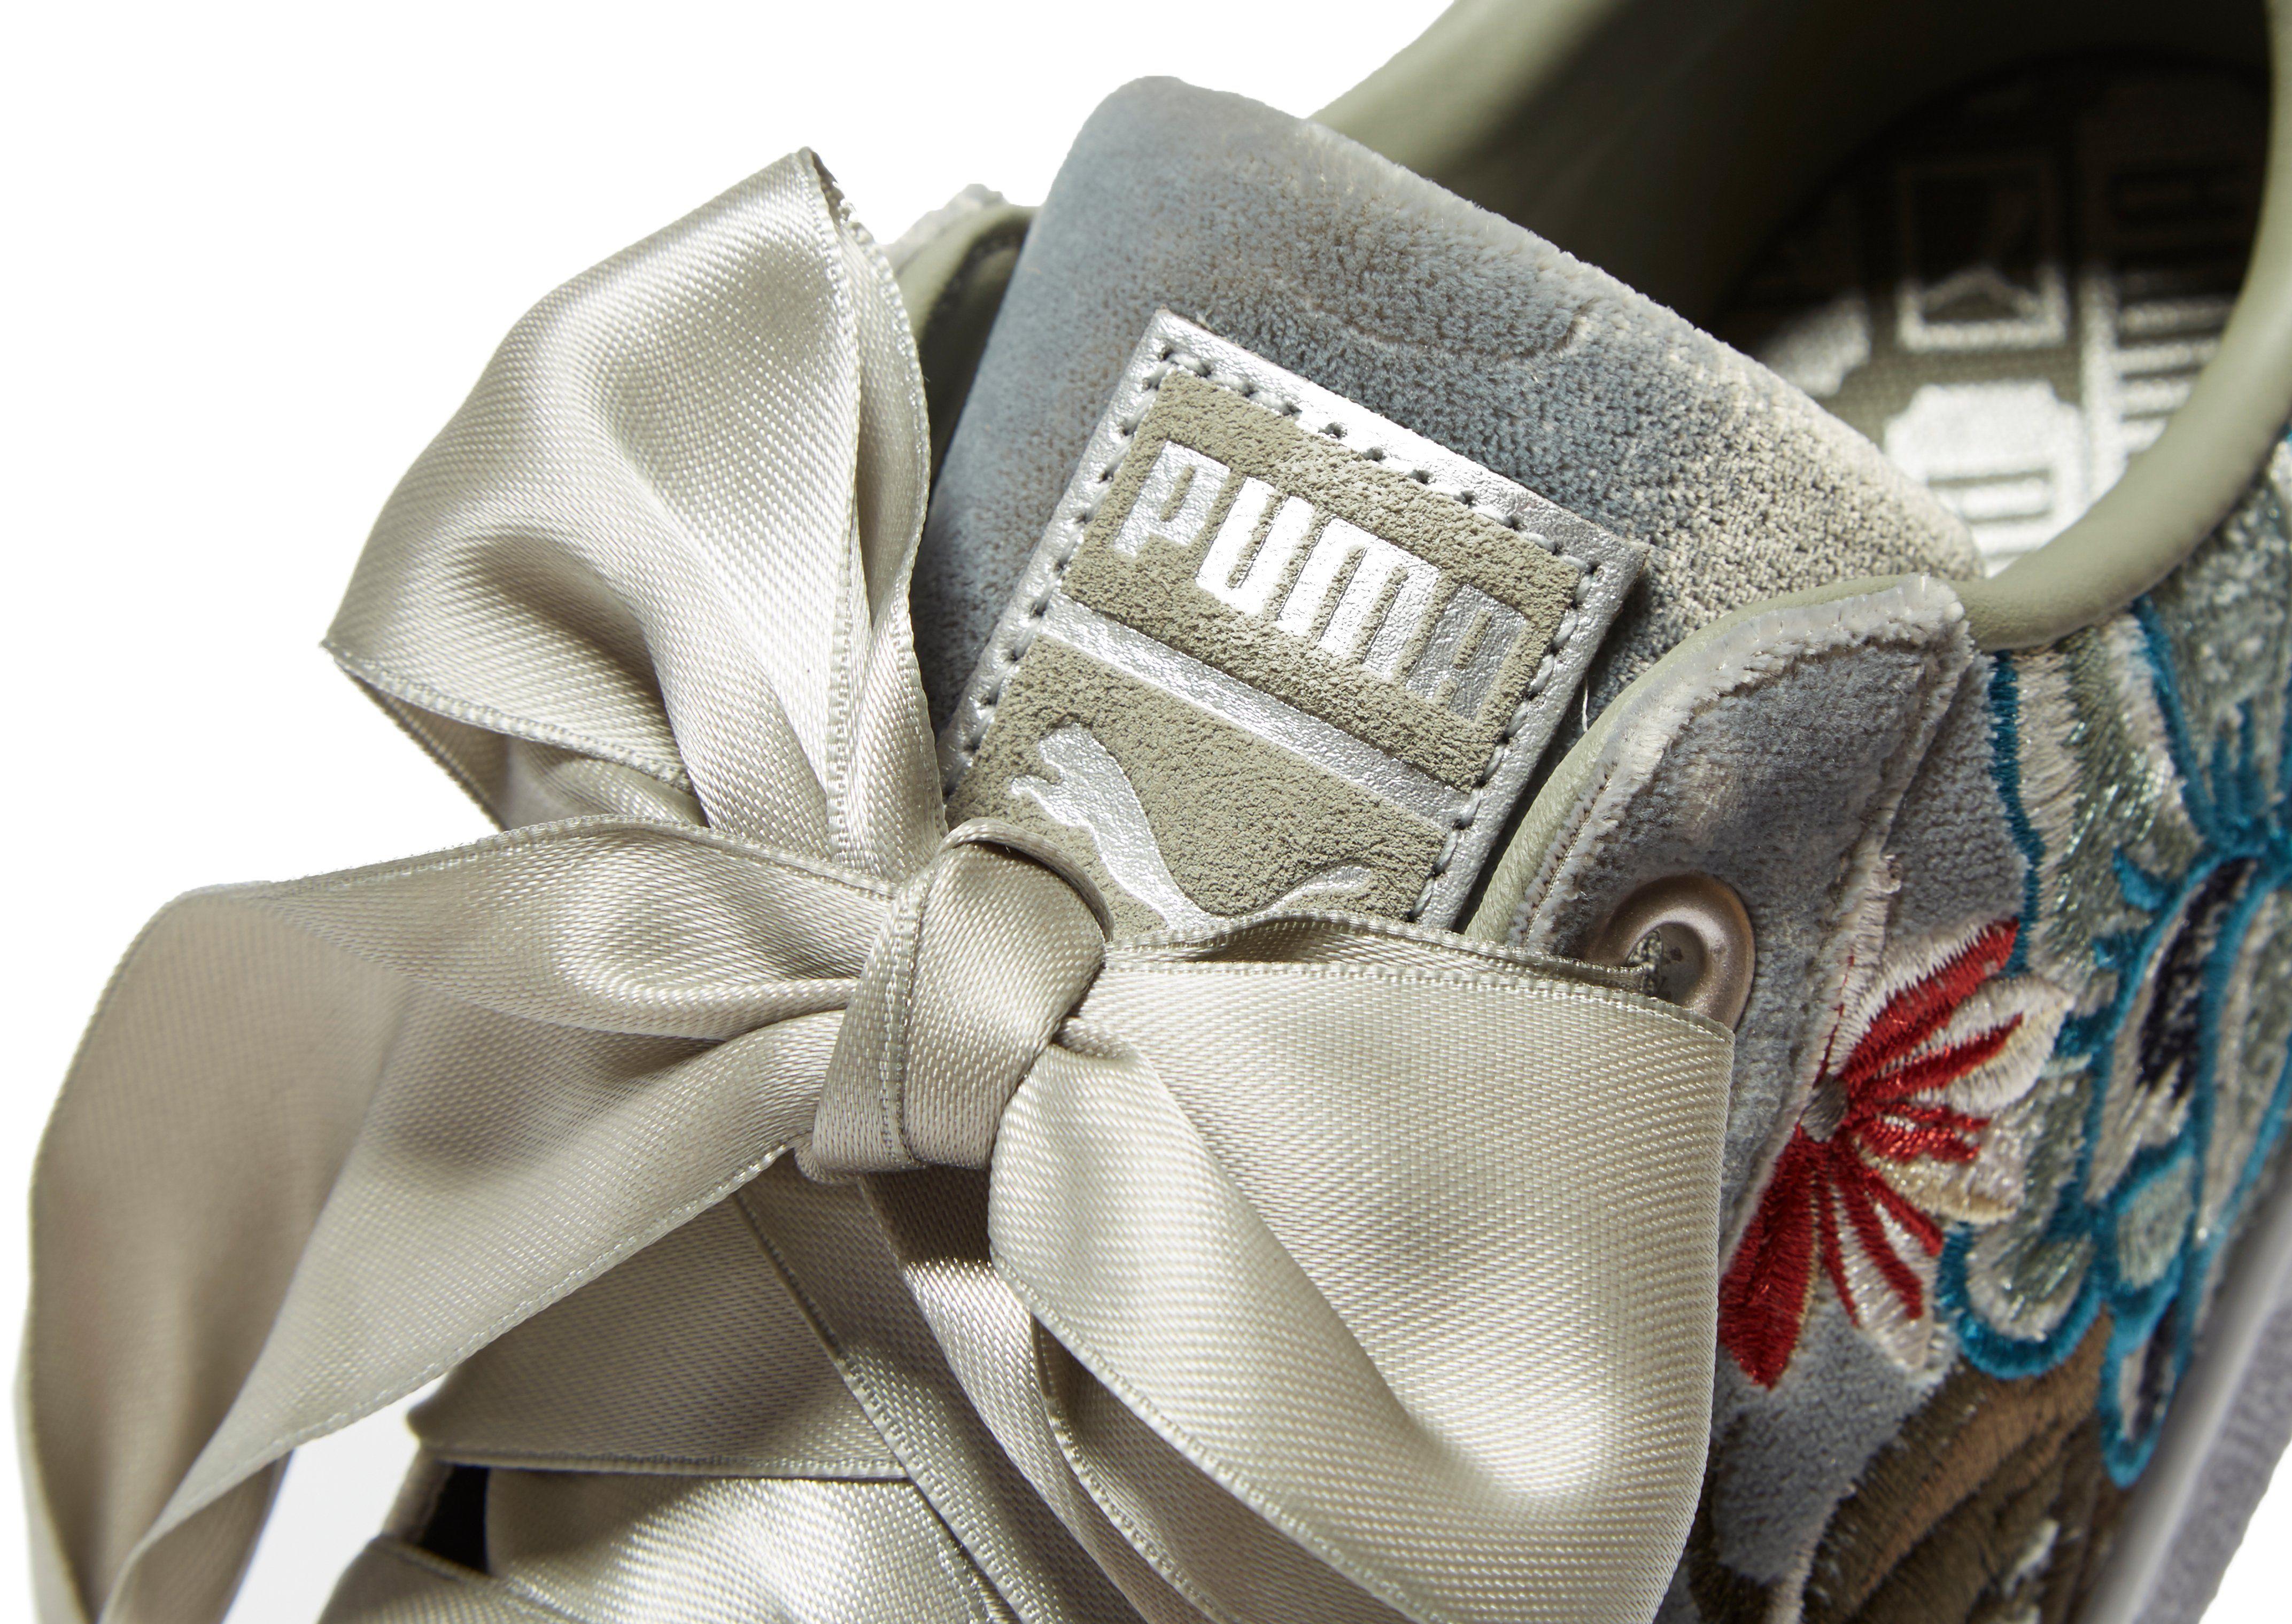 PUMA Basket Heart Embroidered Damen Grau Günstiger Online-Shop qJscDwN